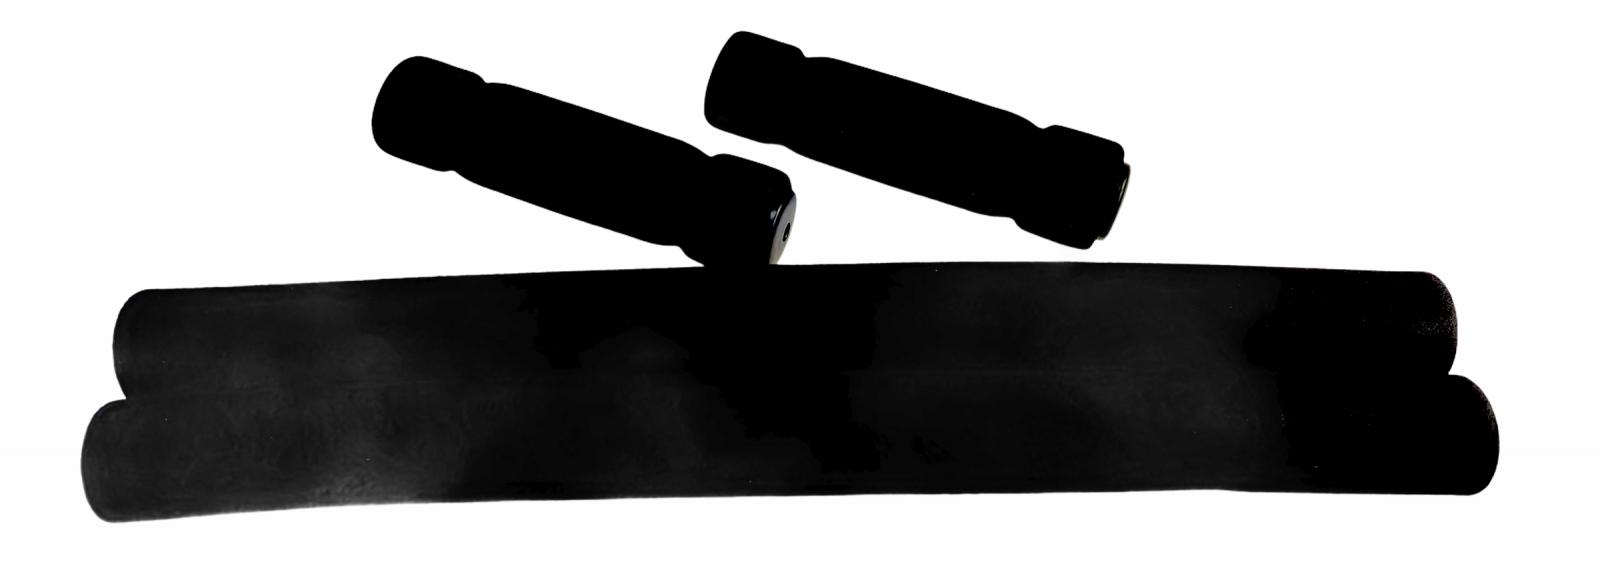 Návleky na bullhorny + pěnové gripy délka 38cm 2+2ks černé Galaxy